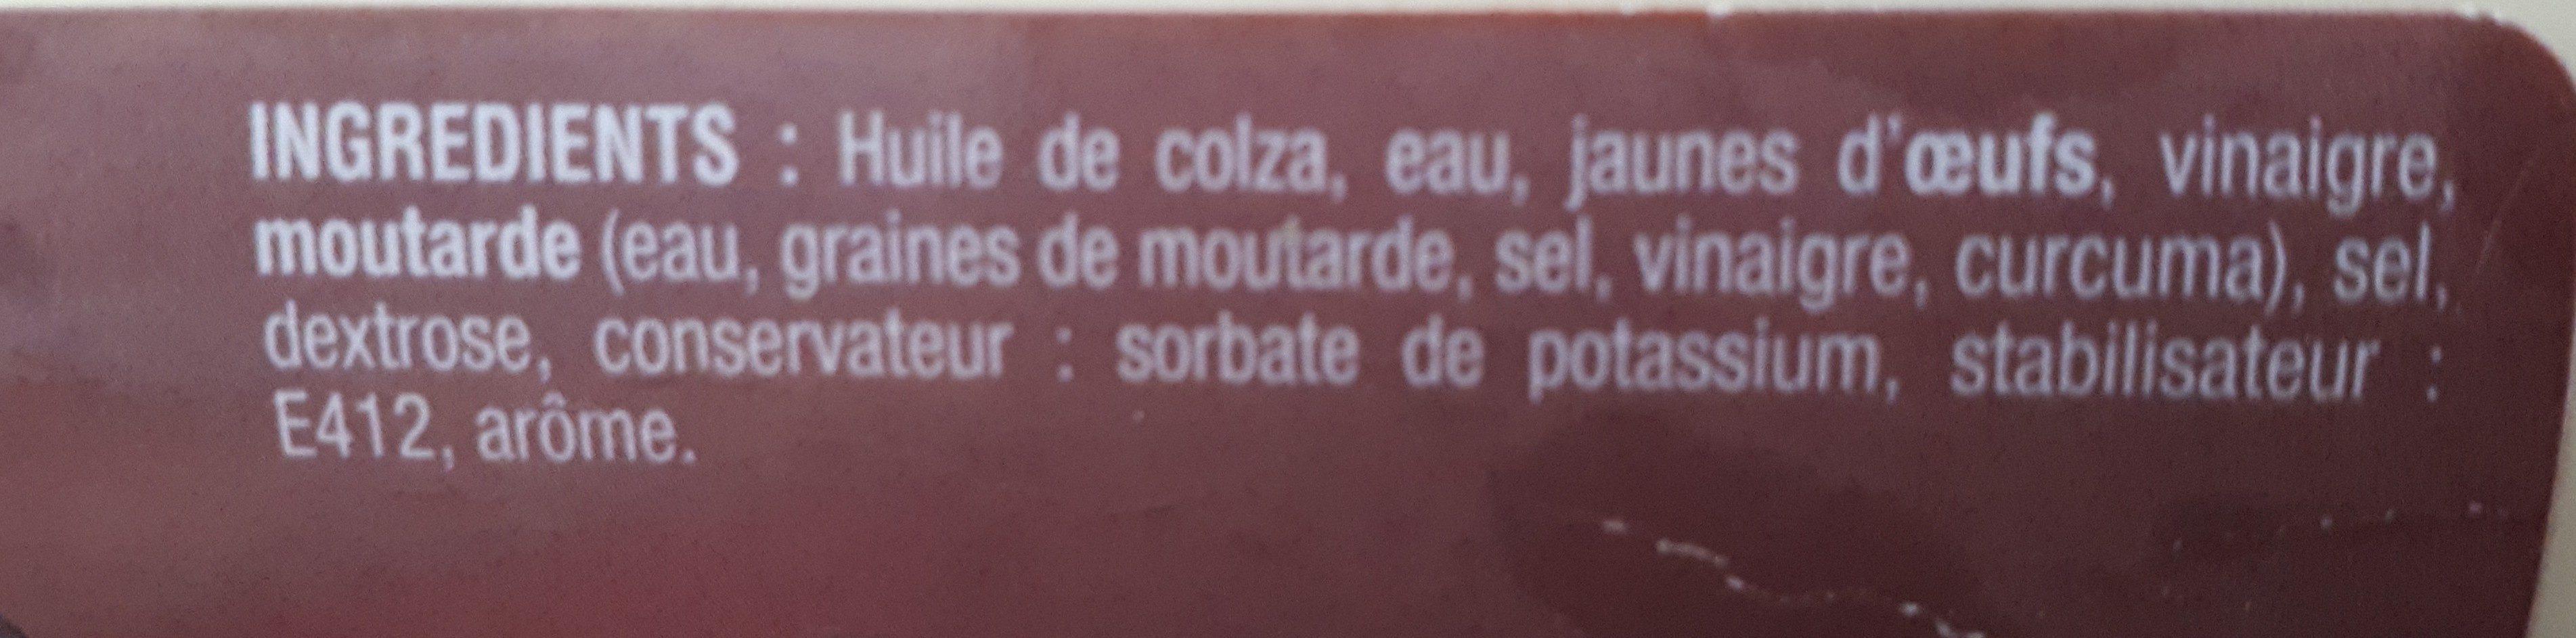 Sauce Mayonnaise Sofram 500 ML X 12 - Ingrédients - fr